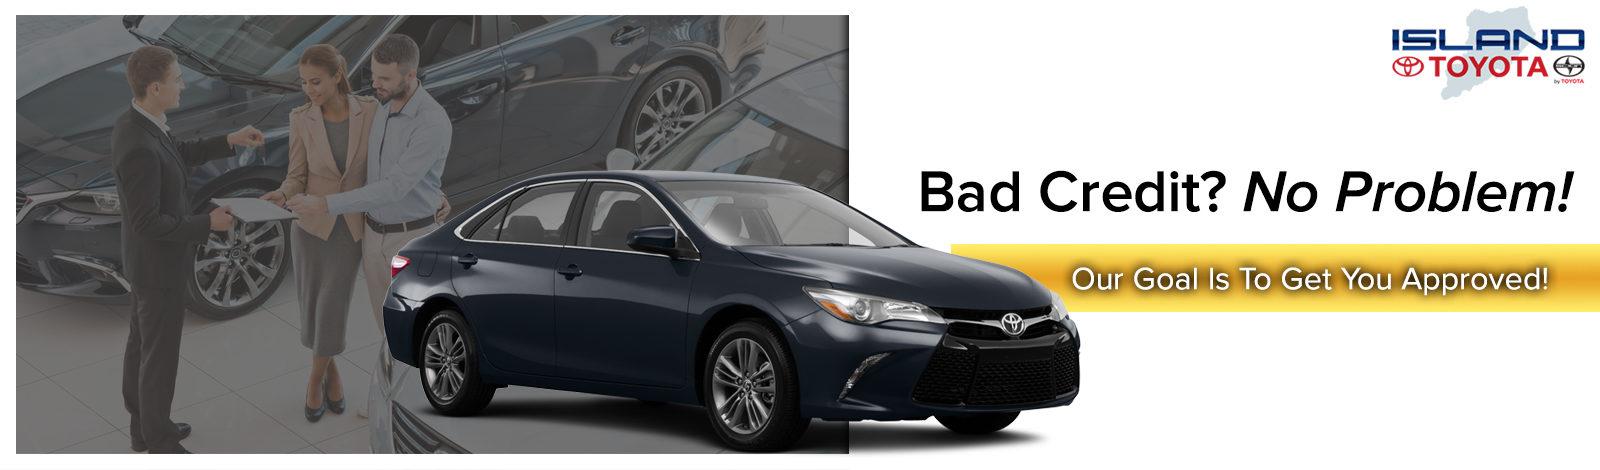 Presidents Day Car Sales 2017 >> Toyota Dealer in Staten Island, NY | Island Toyota